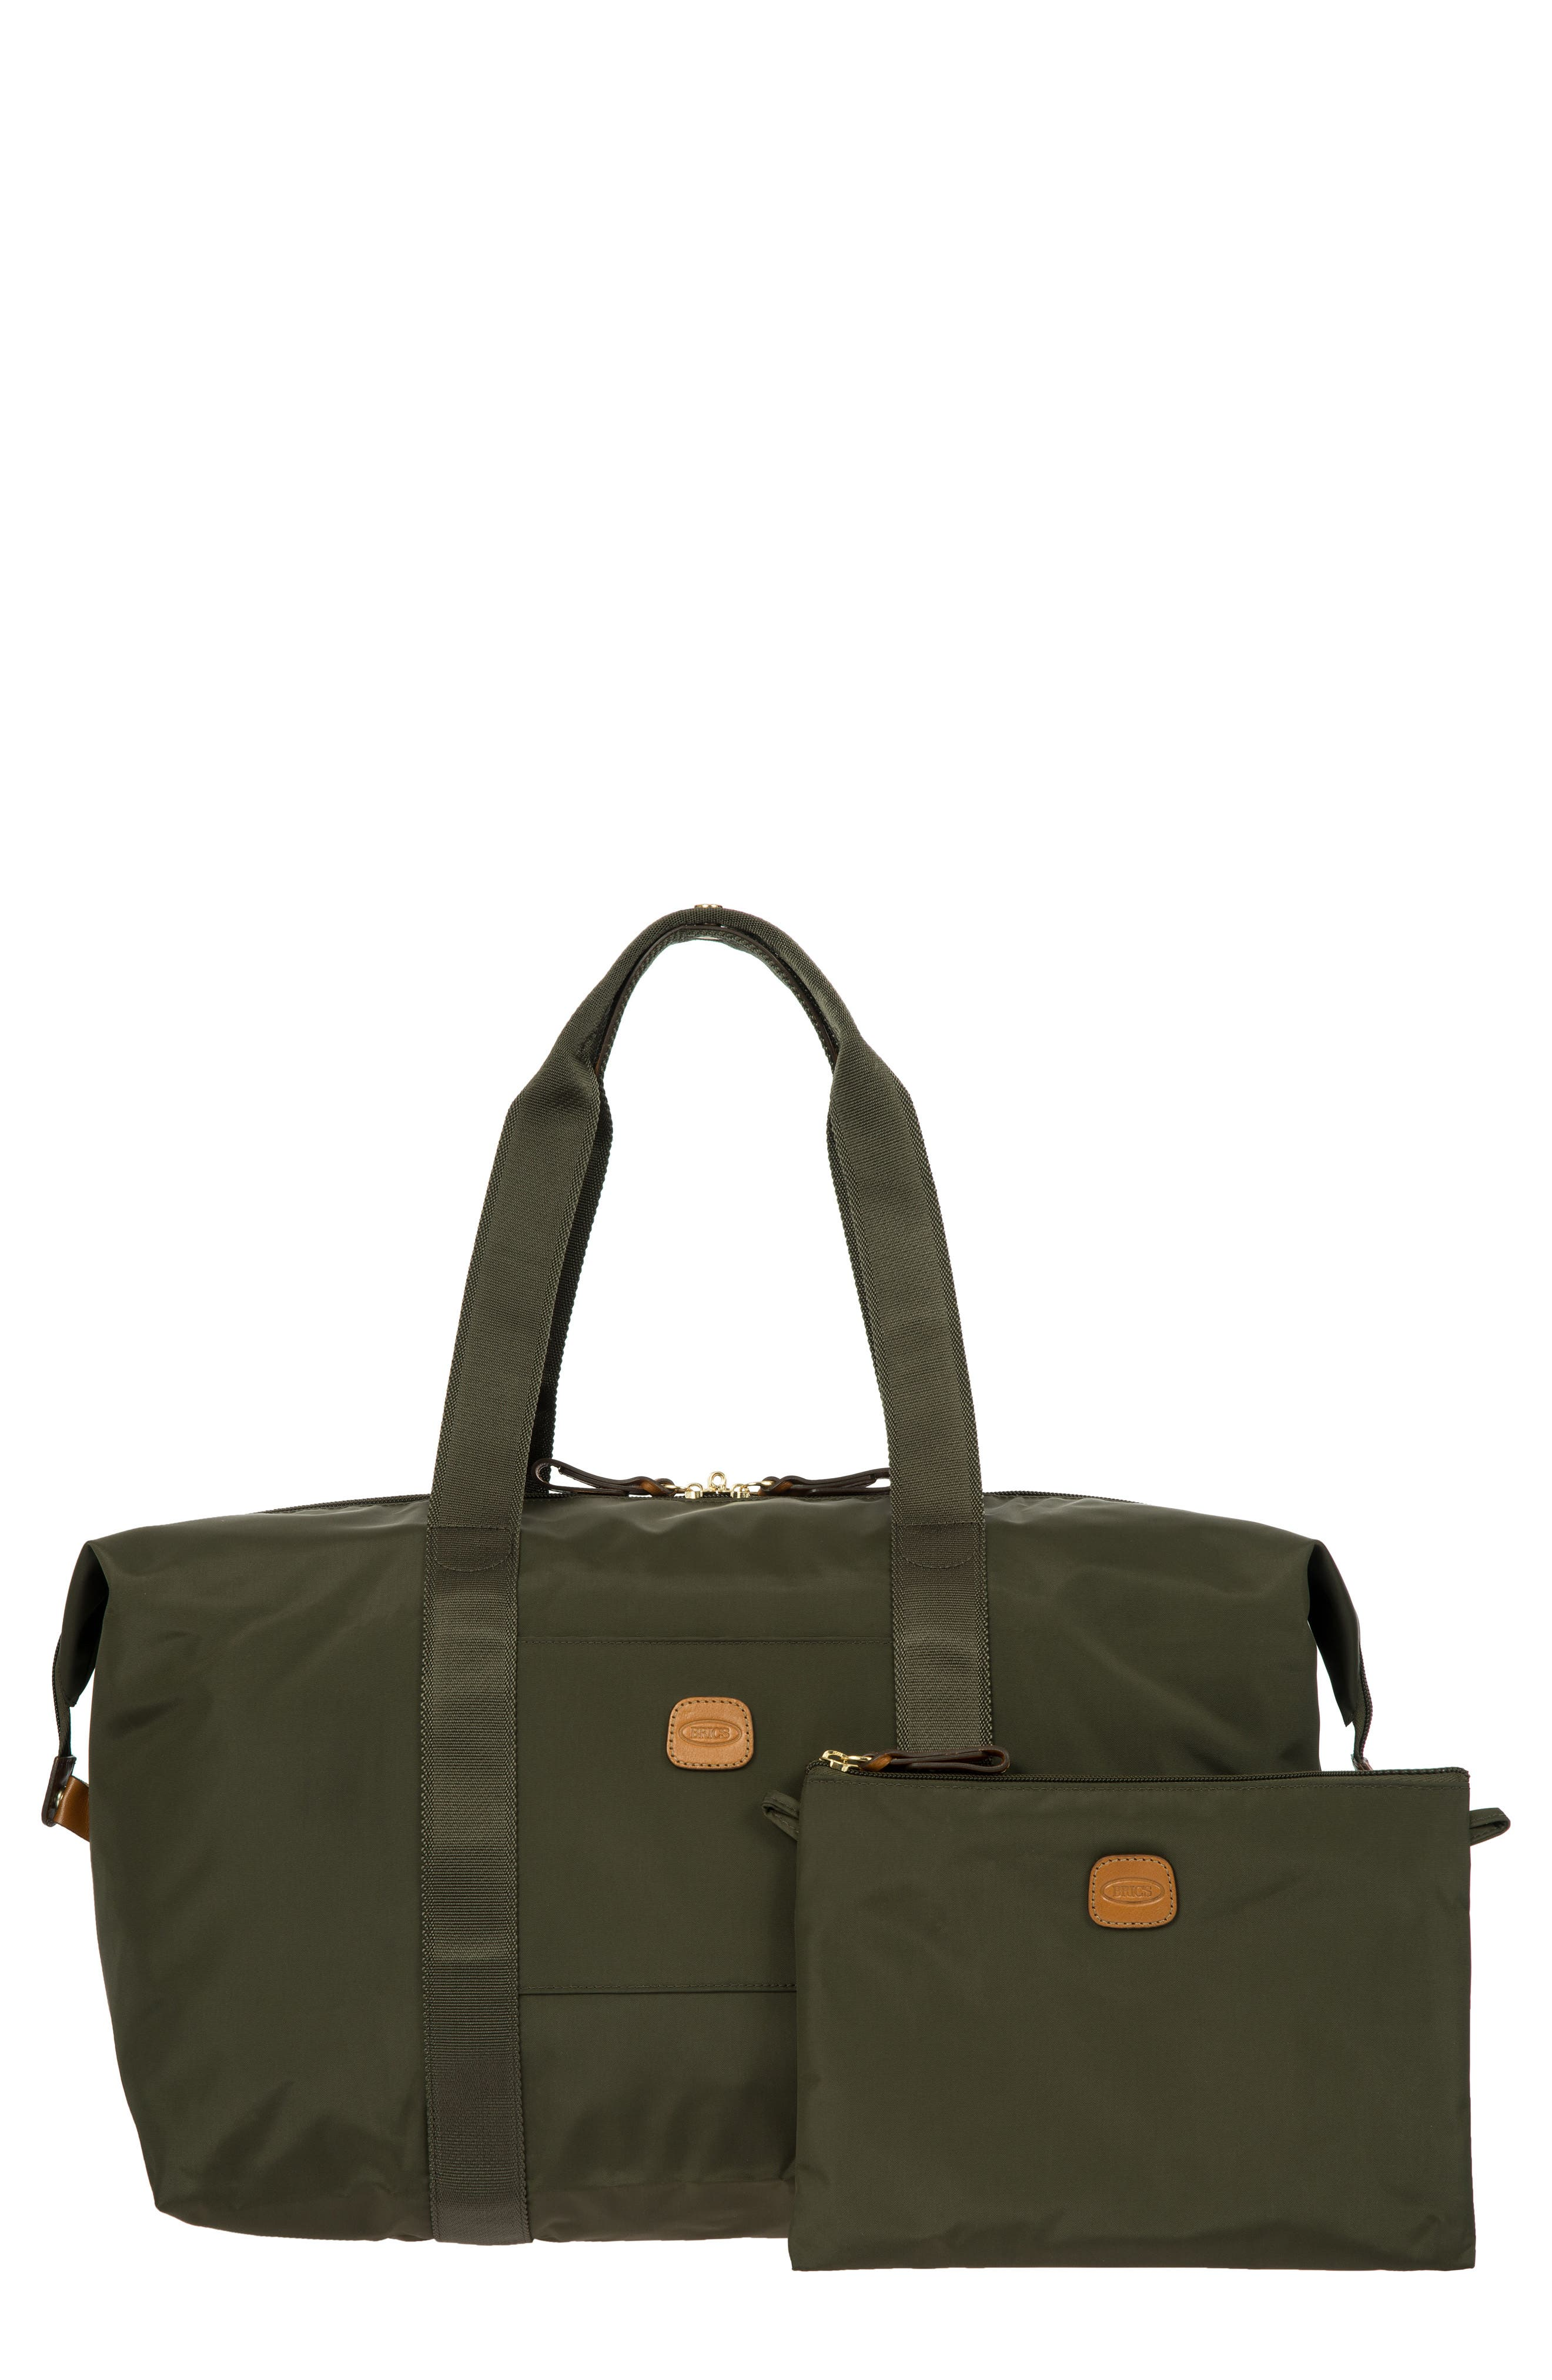 X-Bag 18-Inch Folding Duffel Bag,                             Main thumbnail 1, color,                             Olive